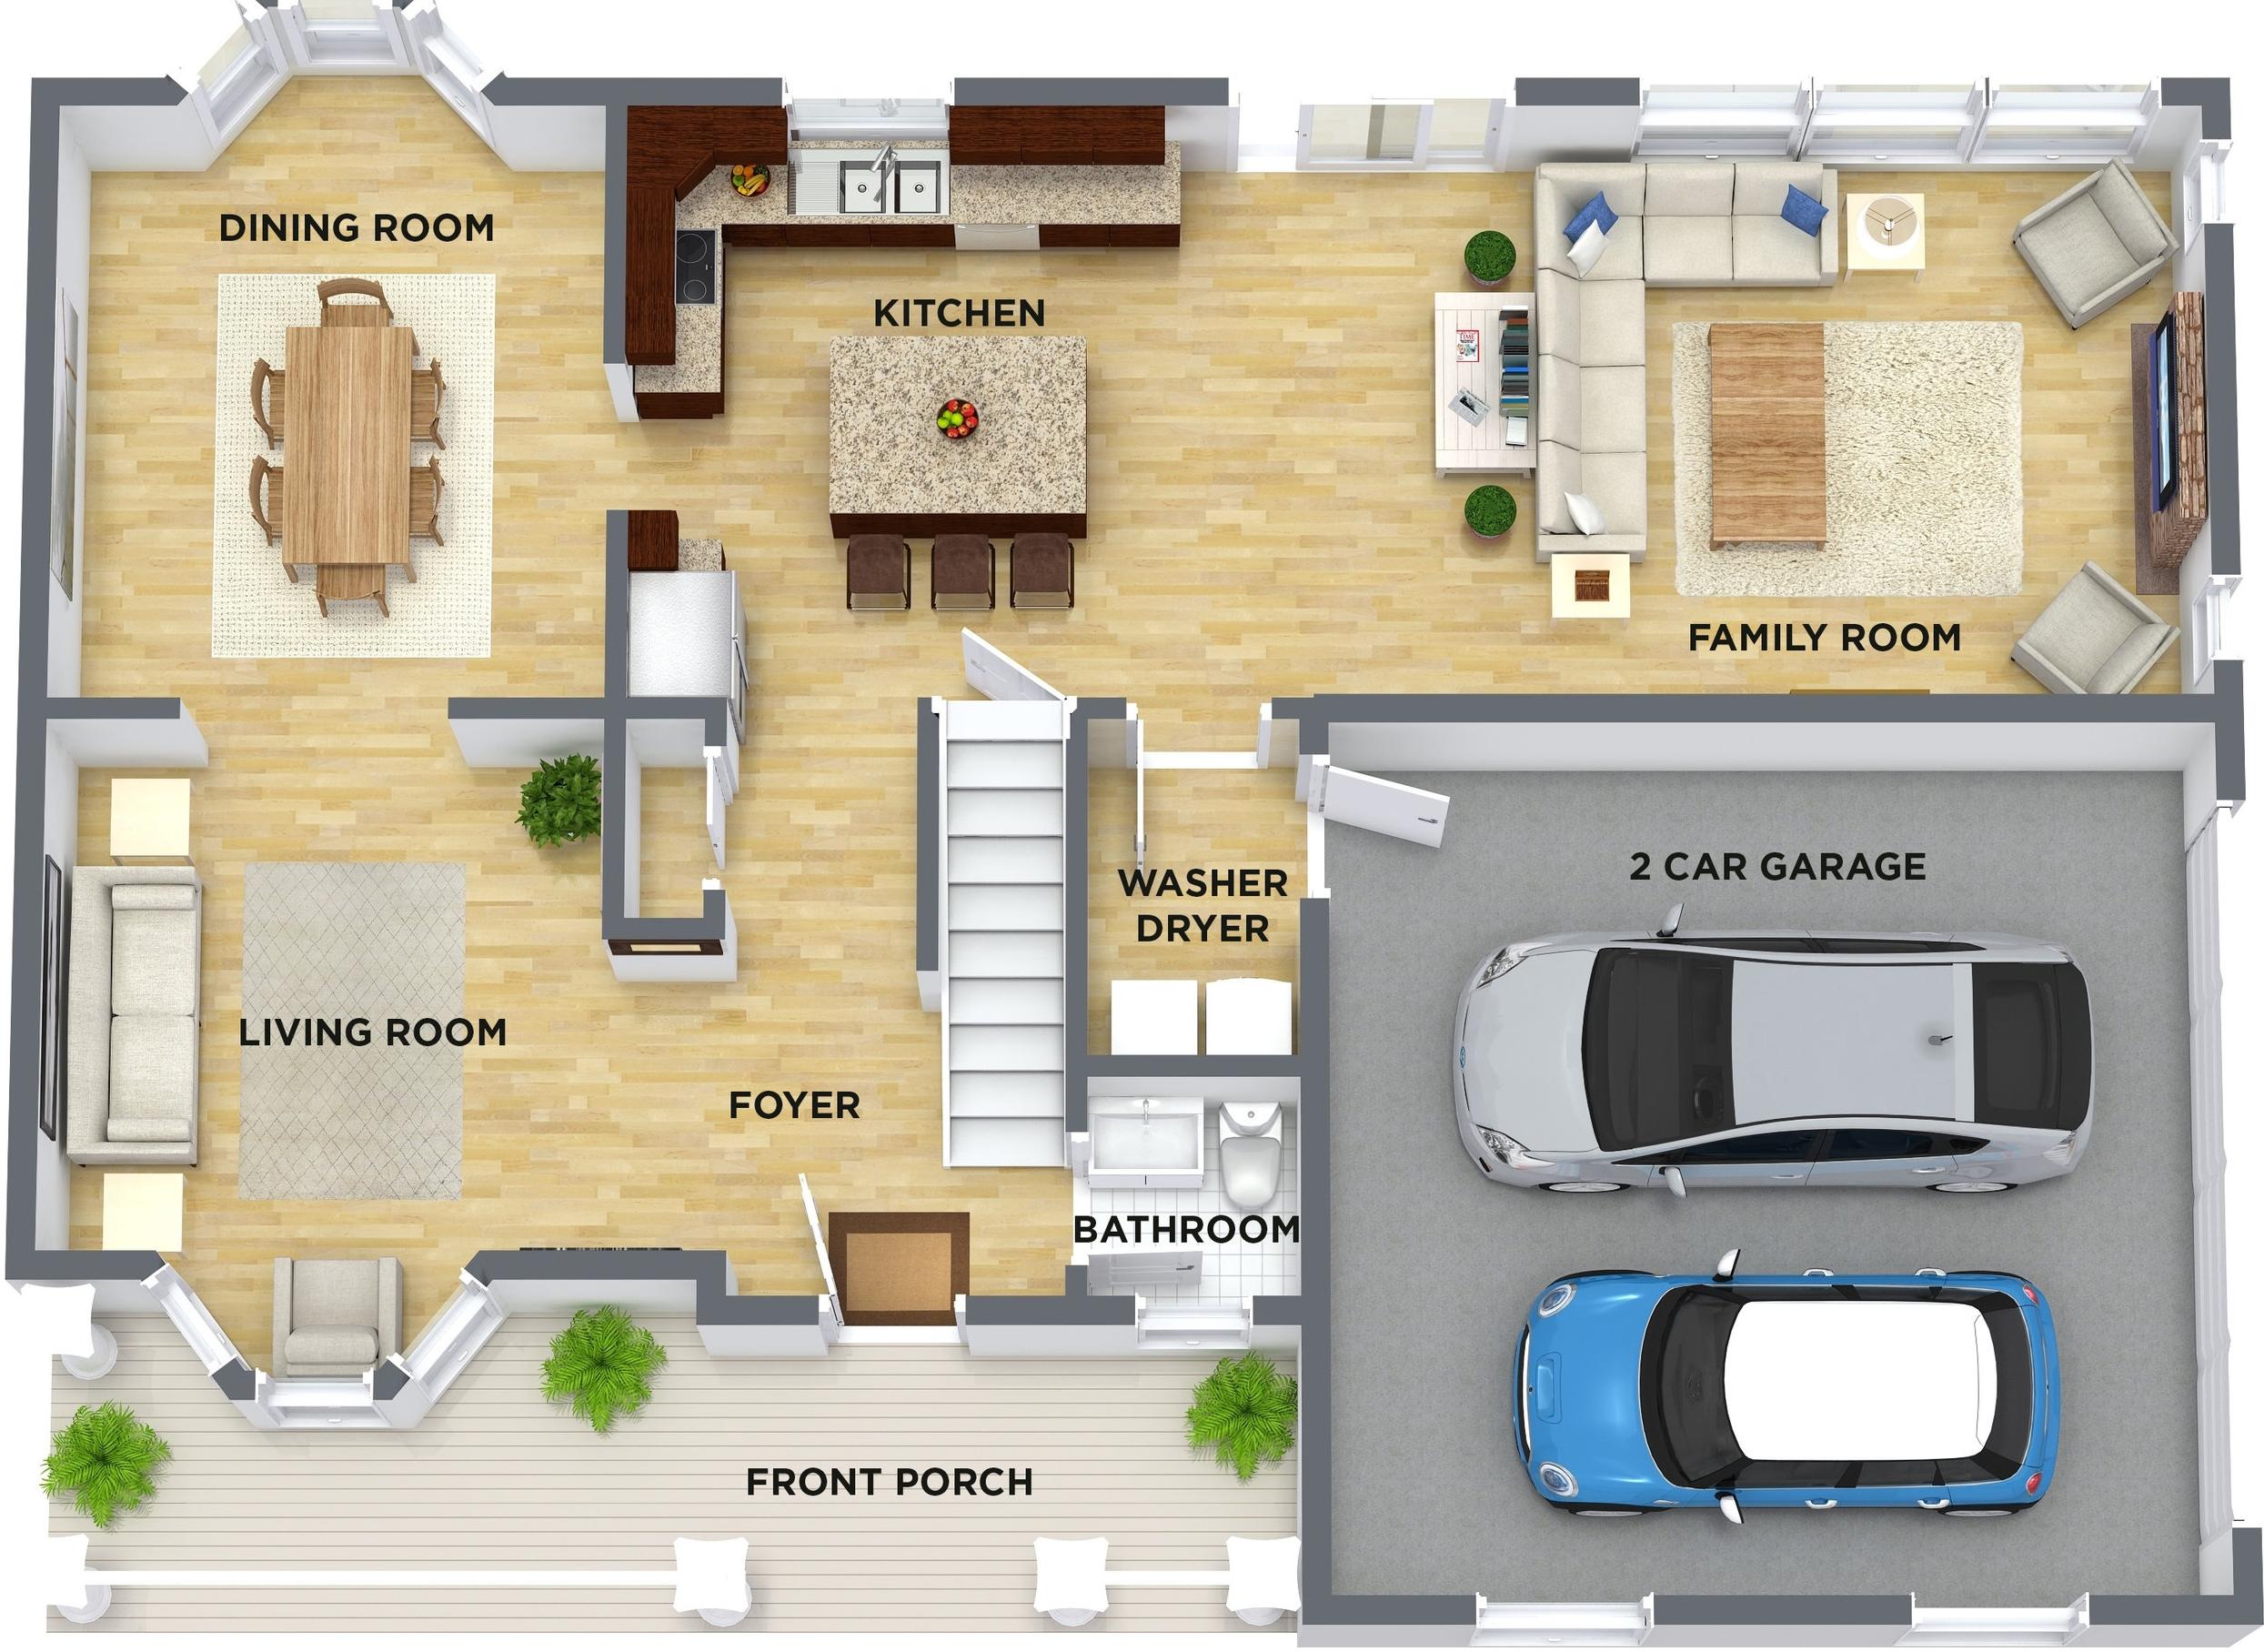 3d Floorplan FLOOR 1.jpg